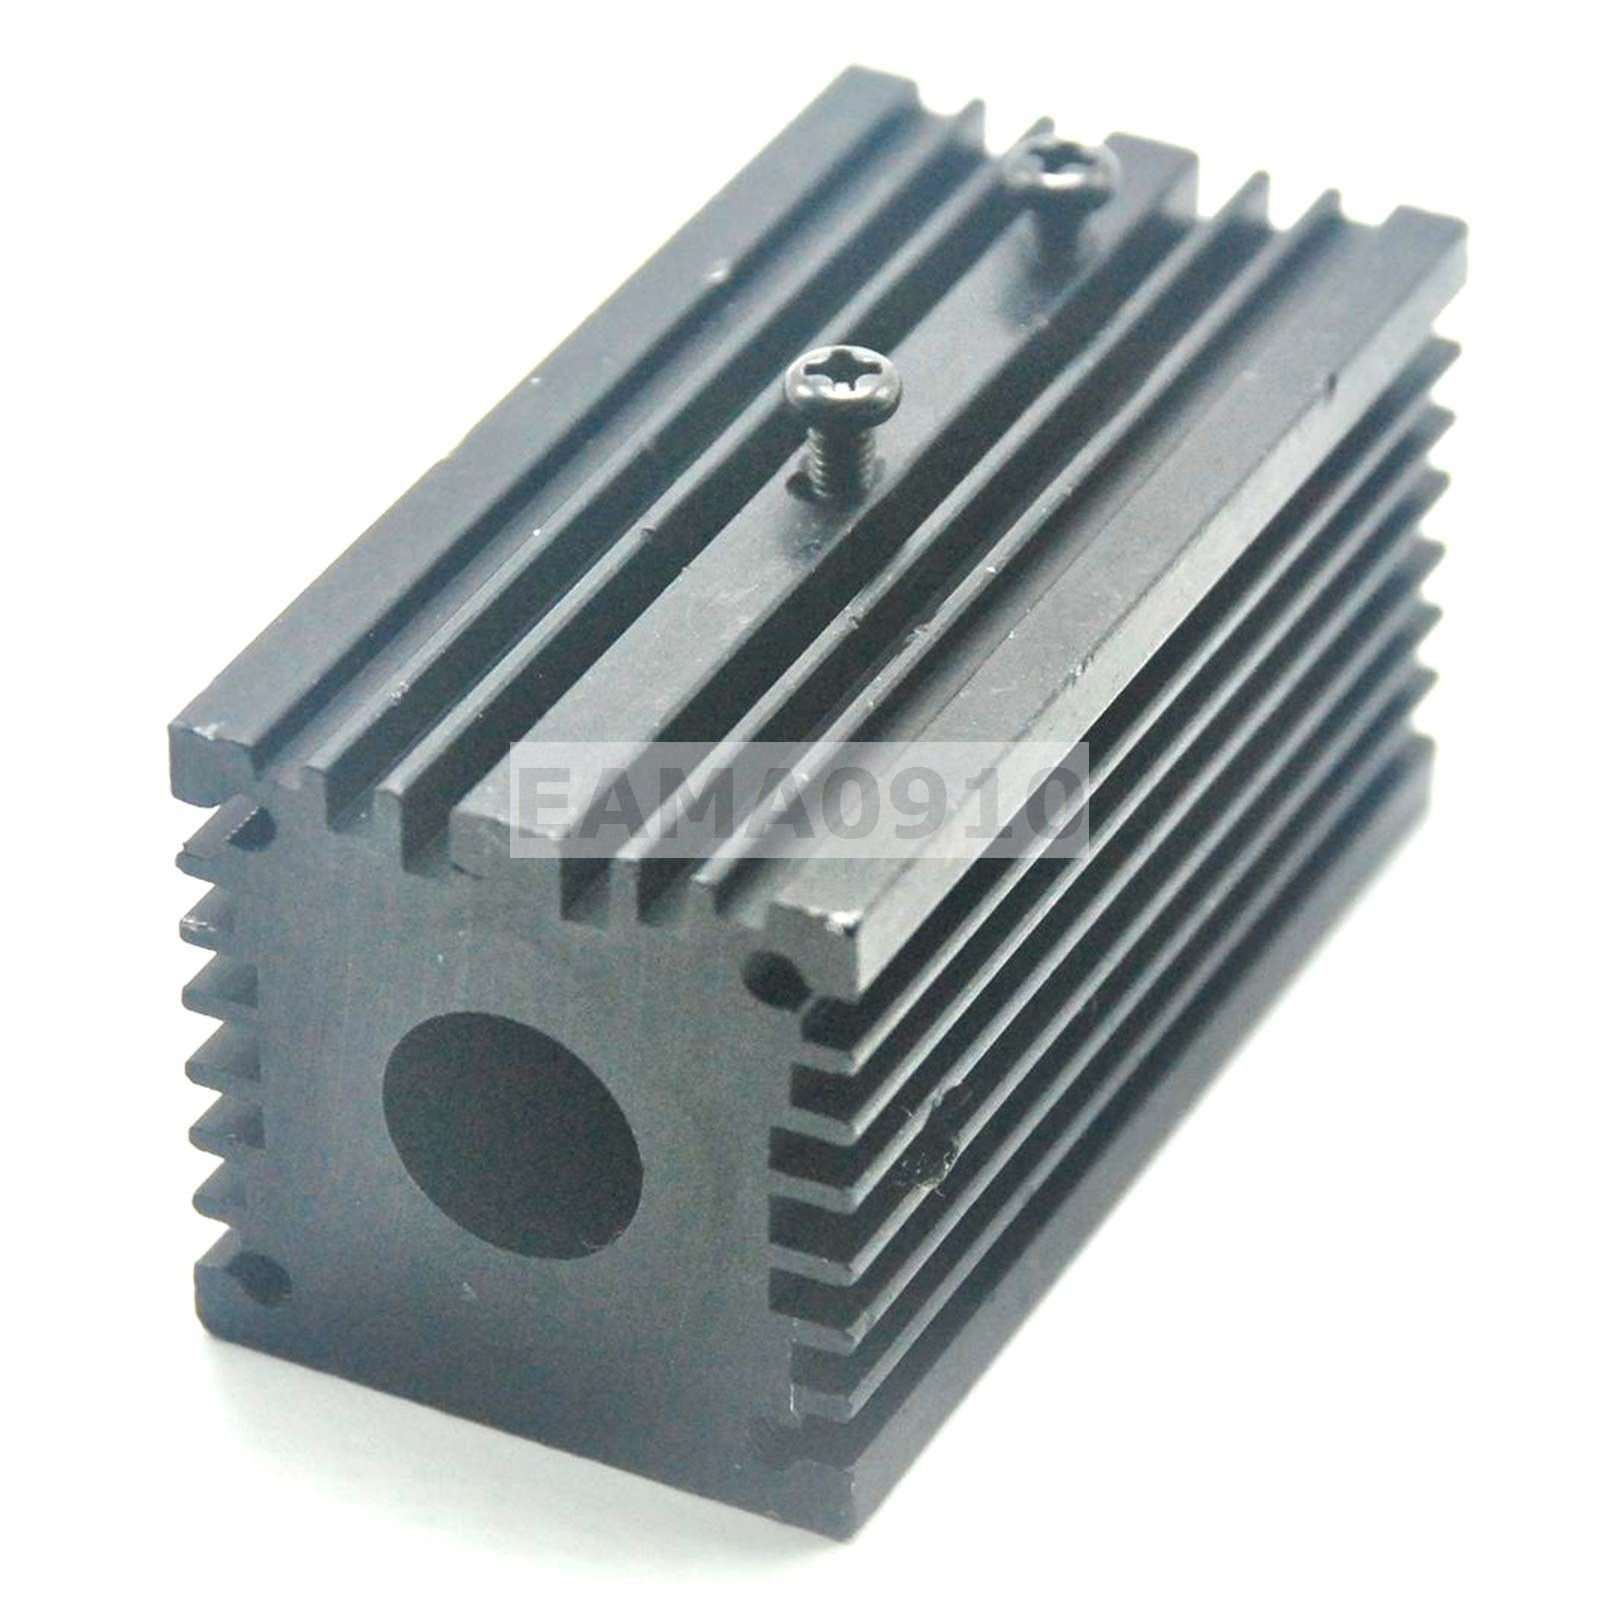 Алюминий охлаждение корпус тепло раковина держатель% 2FMount для 12мм лазера модулей 32x62мм